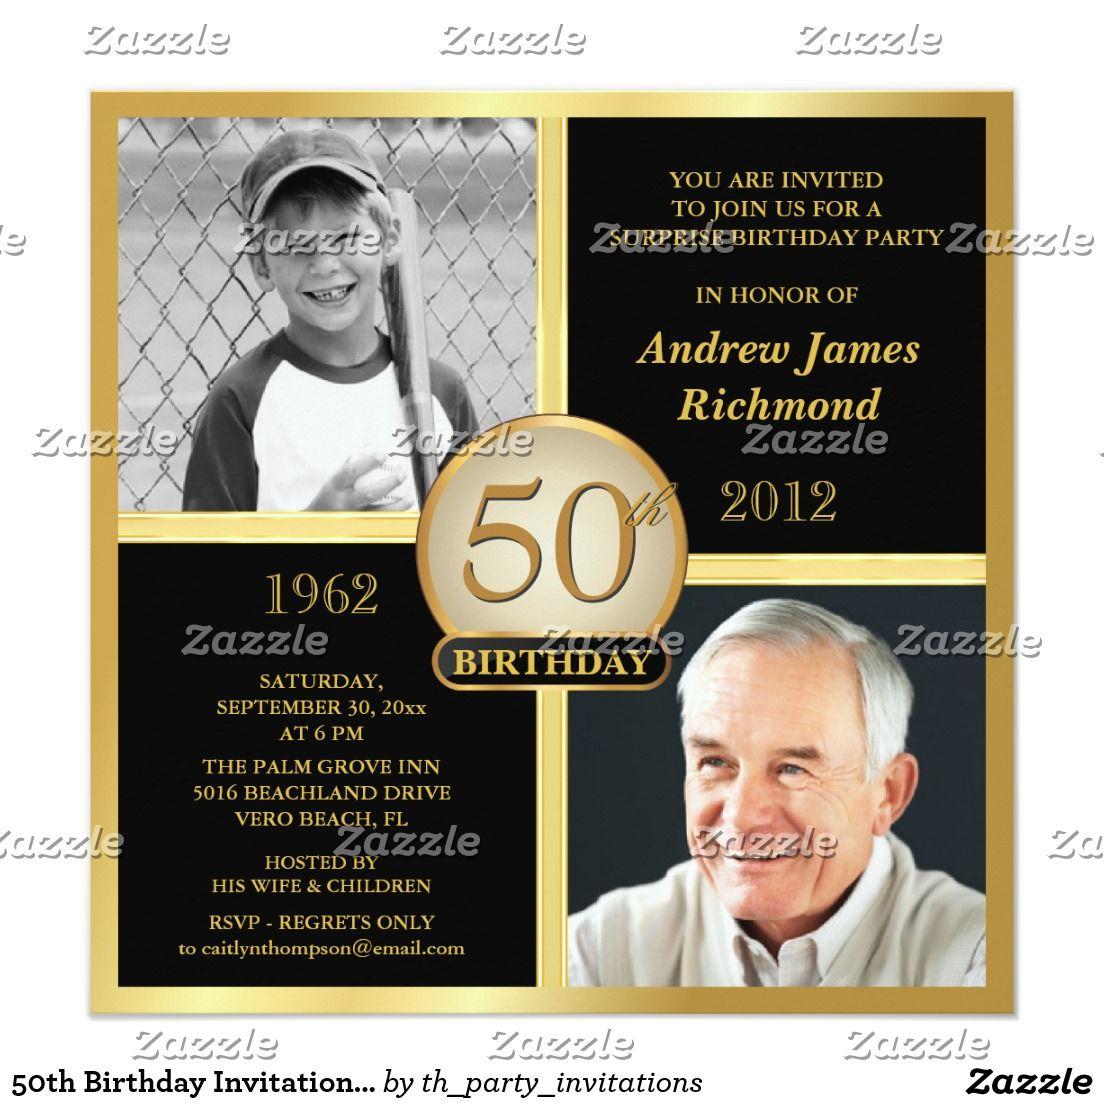 50th Birthday Invitations Then Now 2 Photos